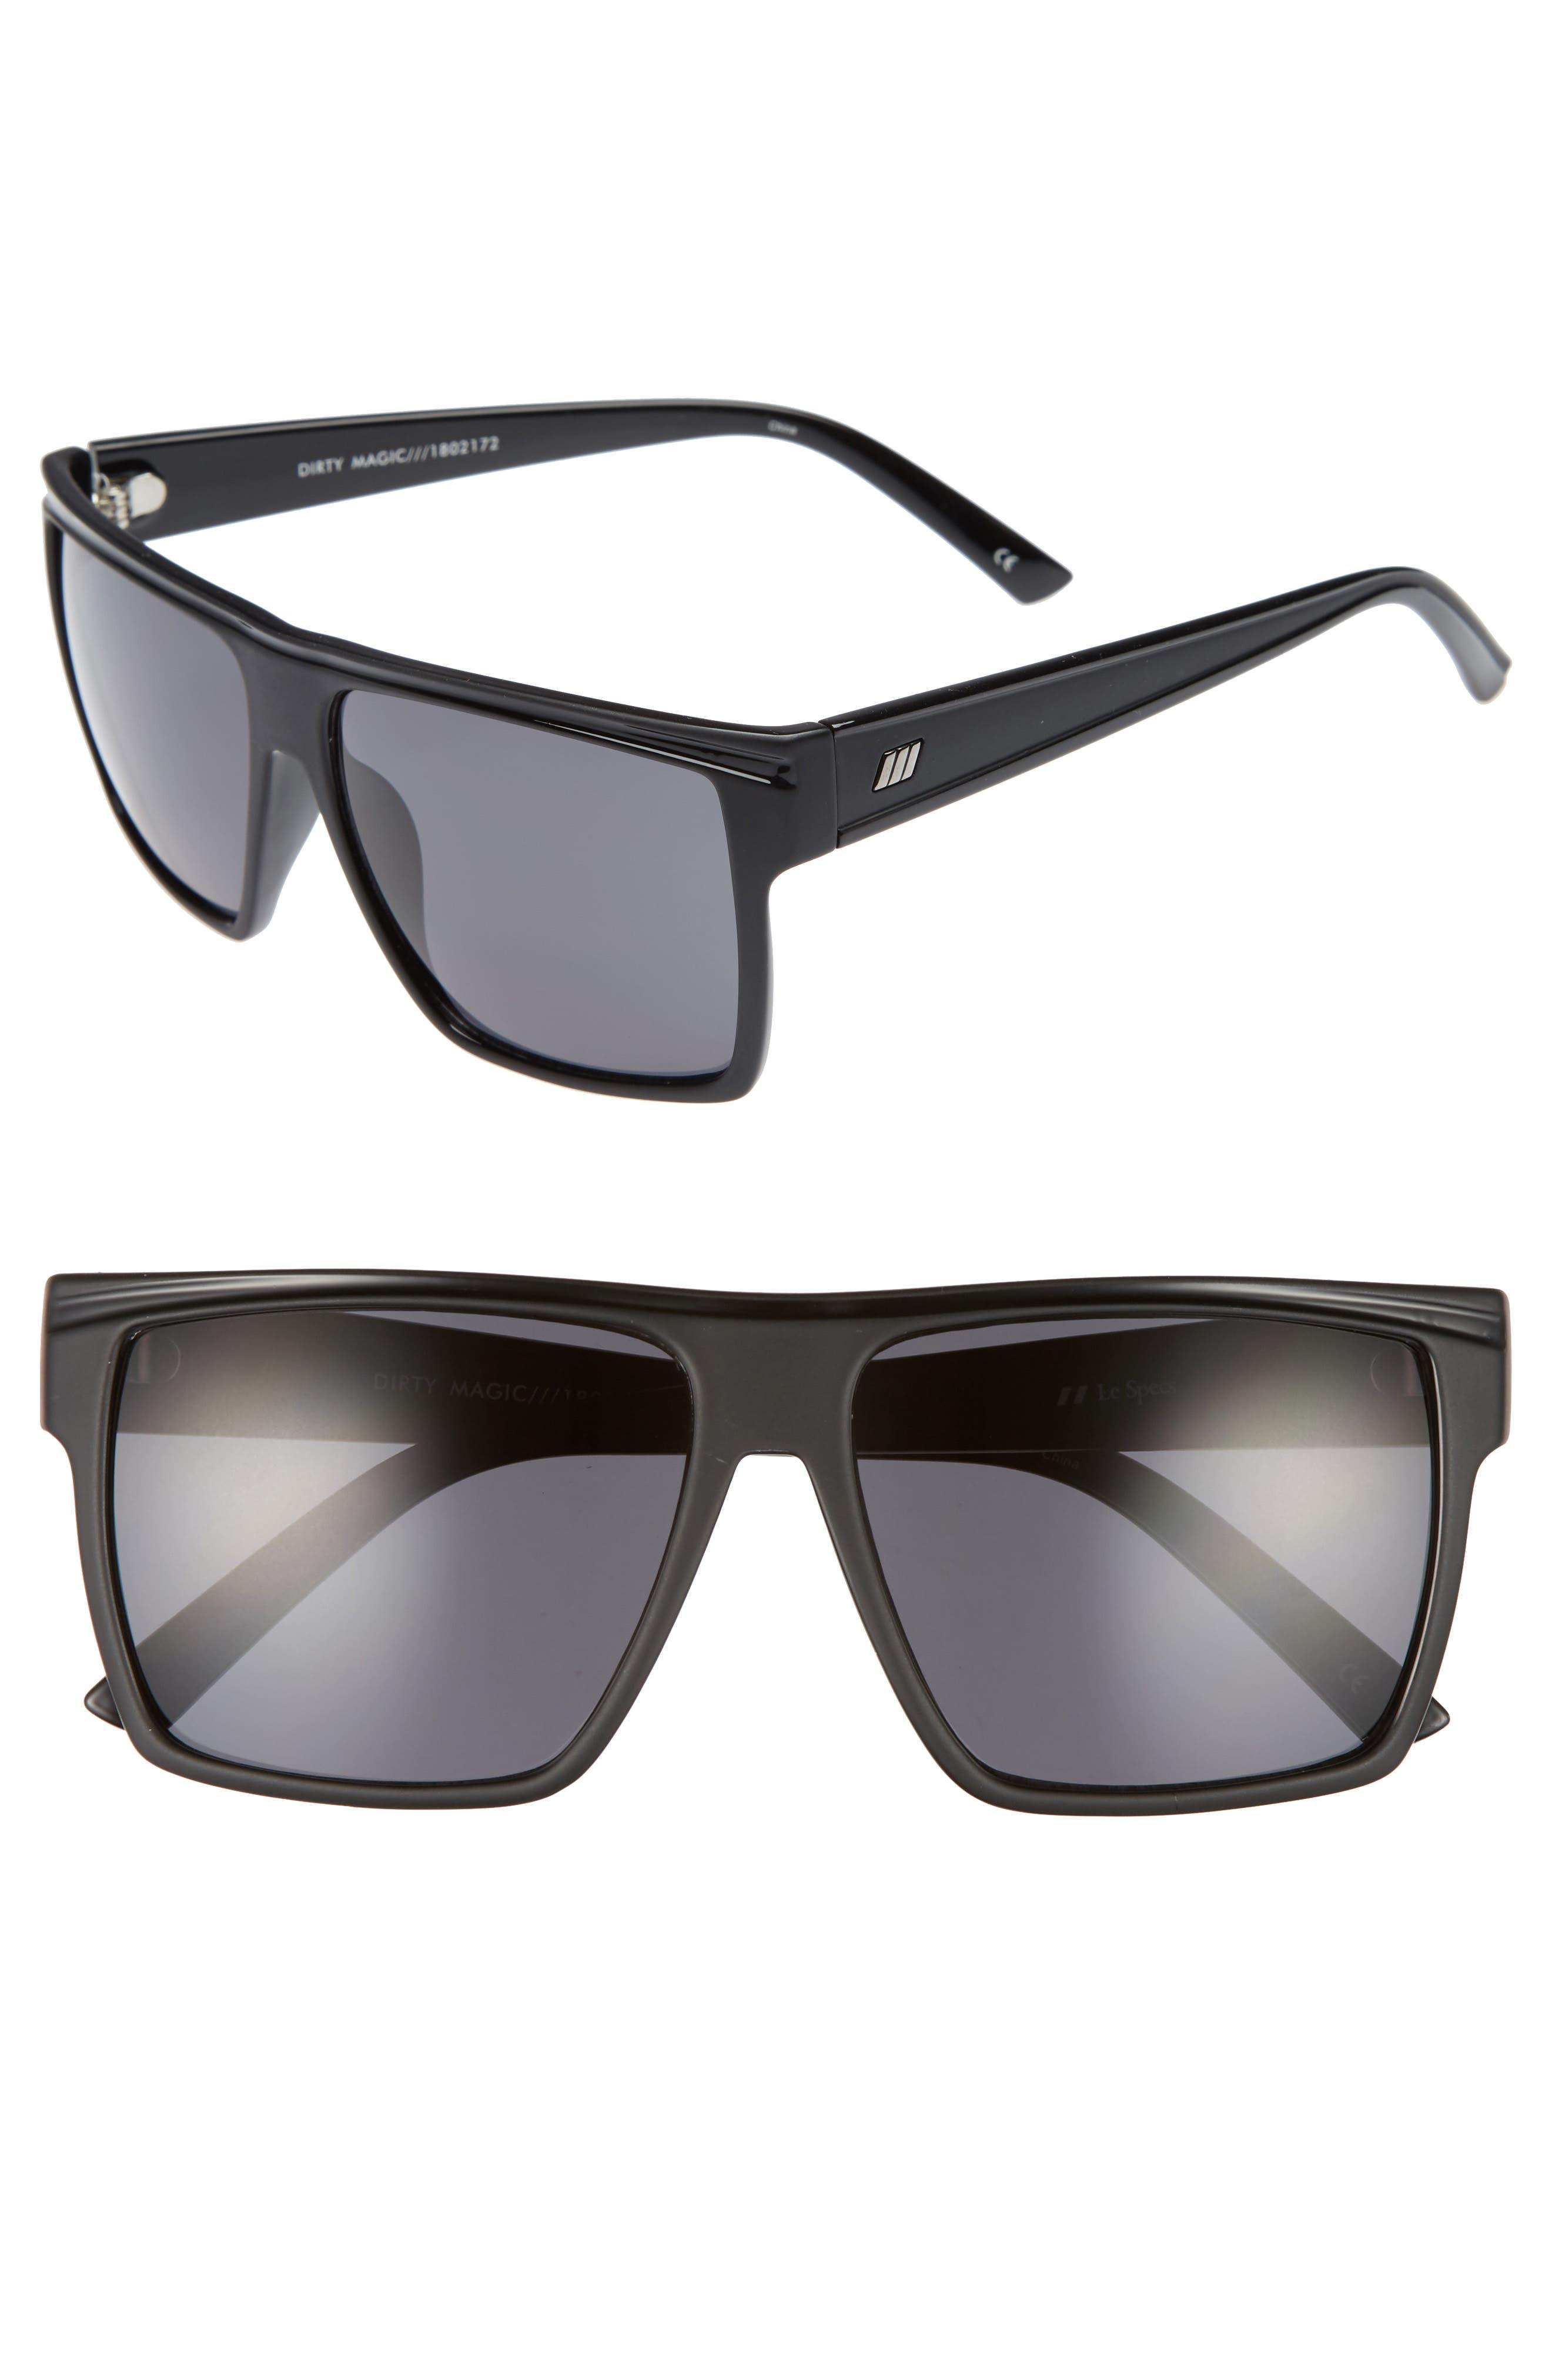 Le Specs Dirty Magic 5m Rectangle Sunglasses -